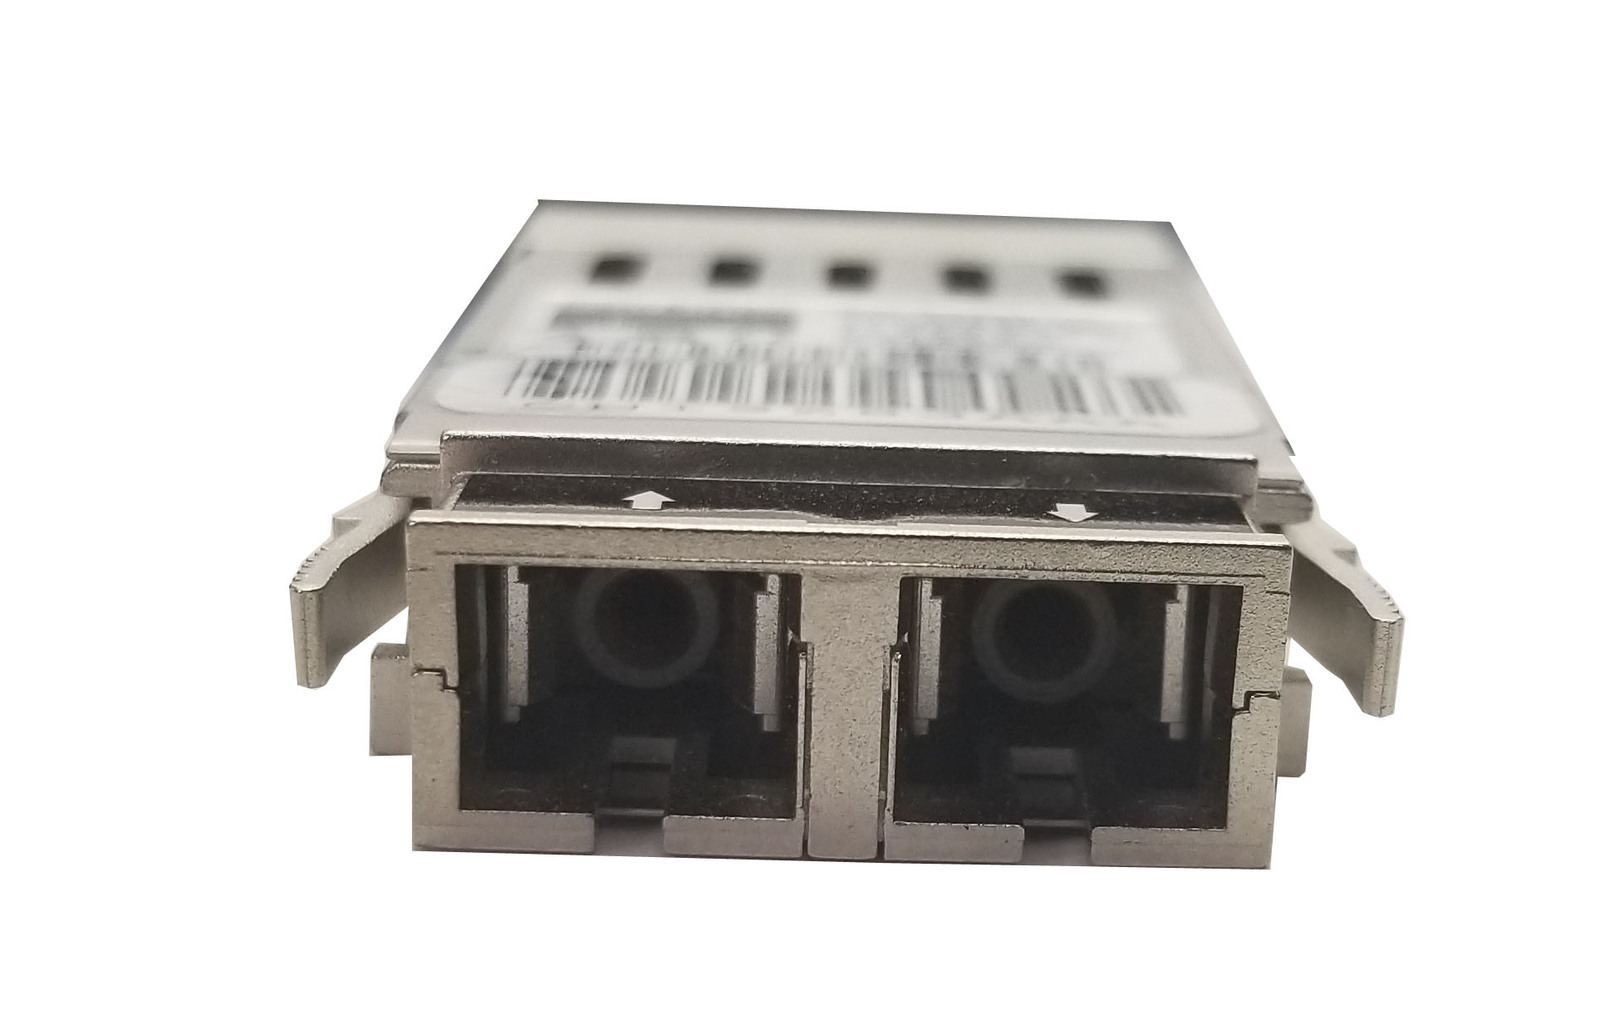 Cisco WS-G5484 1000BASE-SX Fiber GBIC Module (LOTOF30) Bin:2